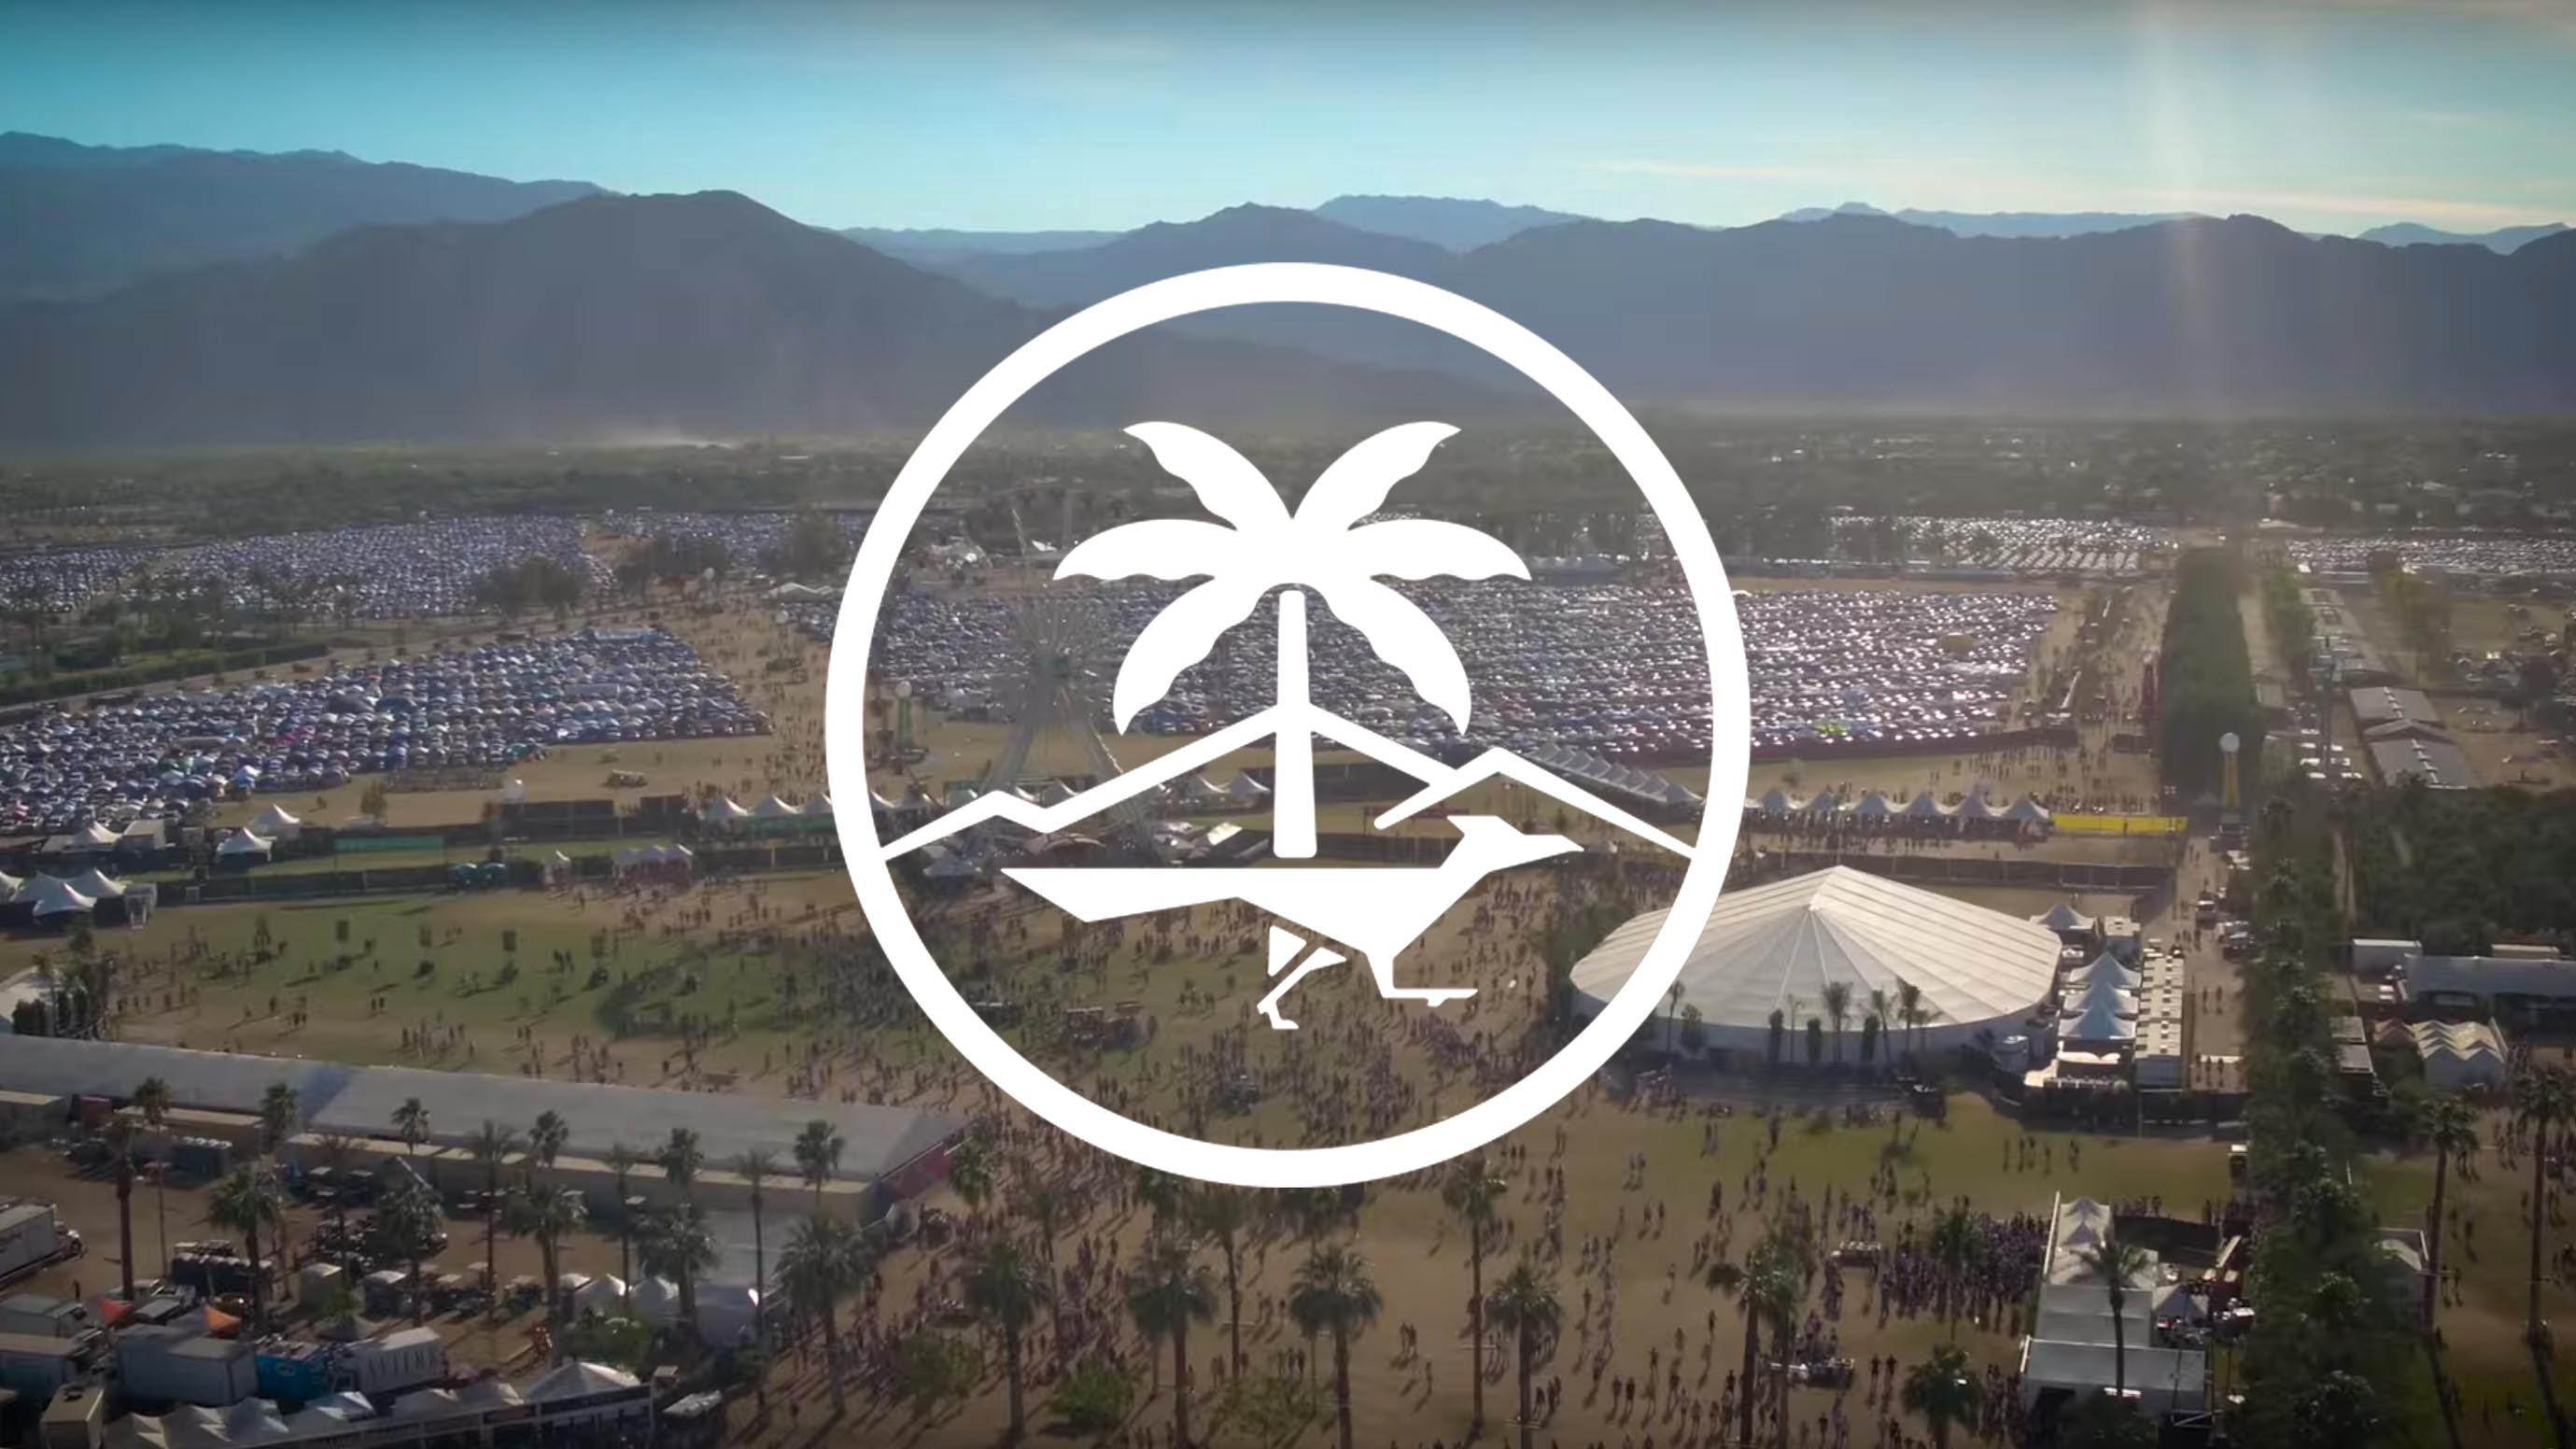 Complete Coachella 2017 festival lineup announced